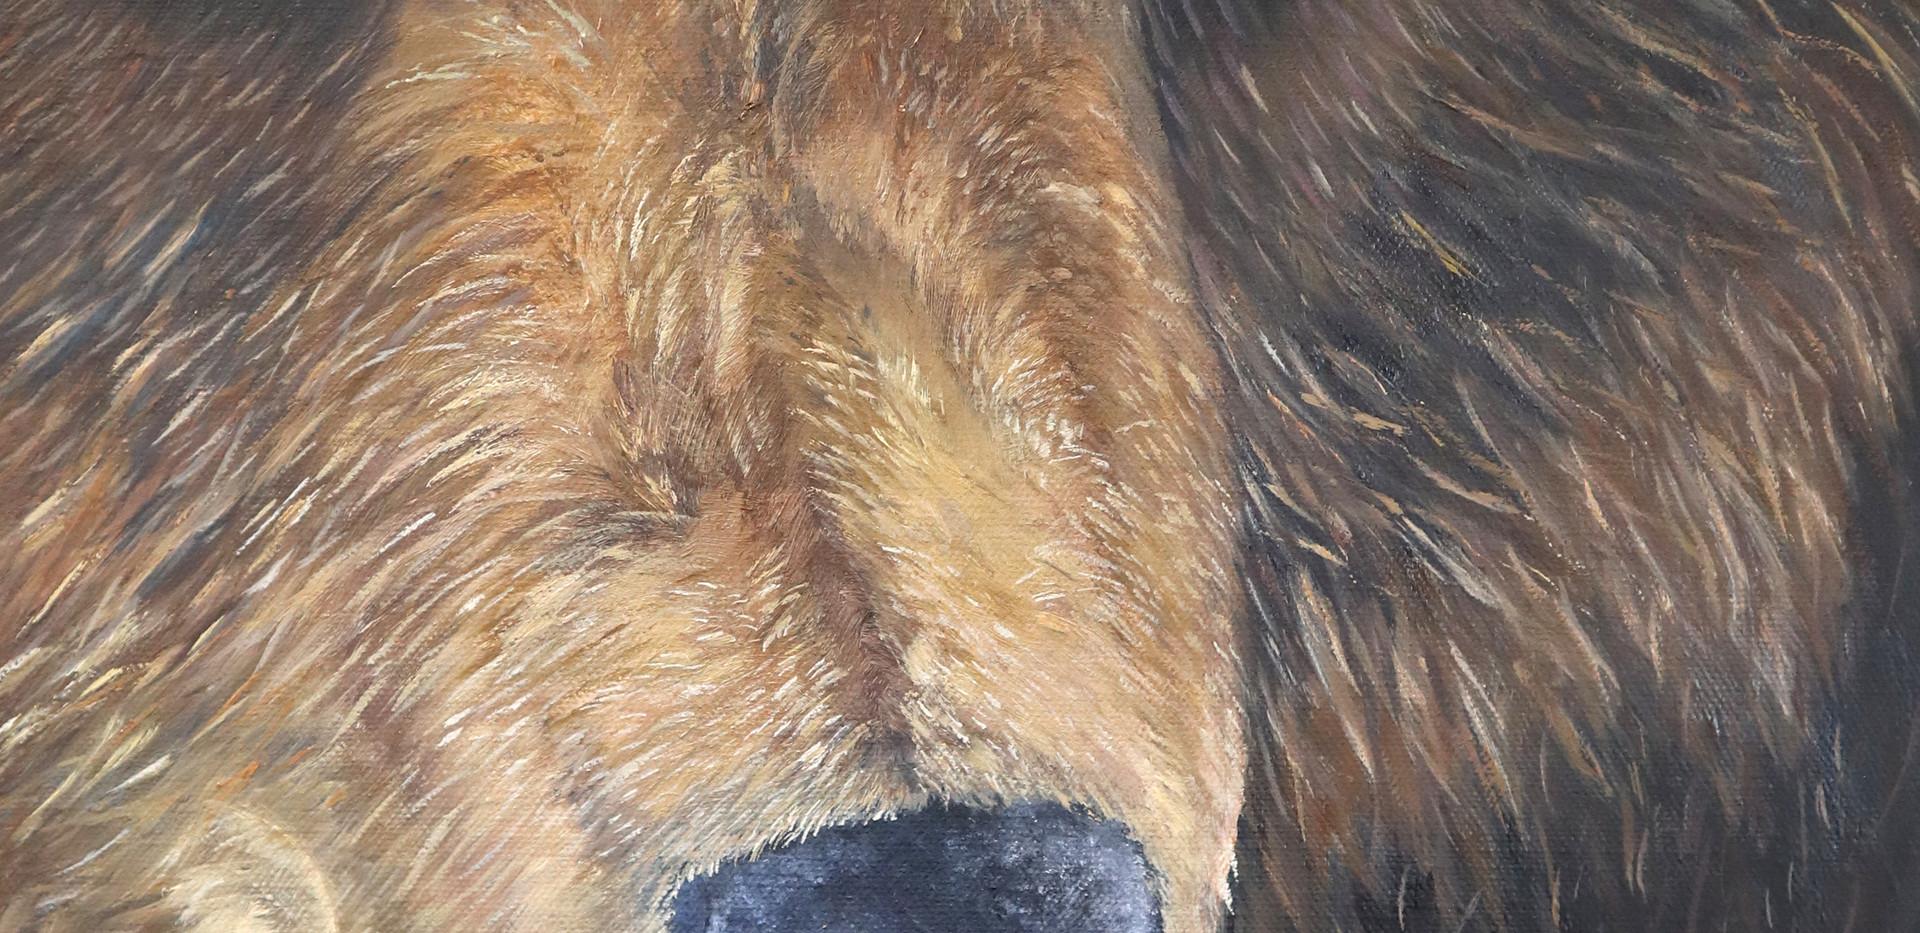 Debbie Kwok - Bear Series, The Bear, 201